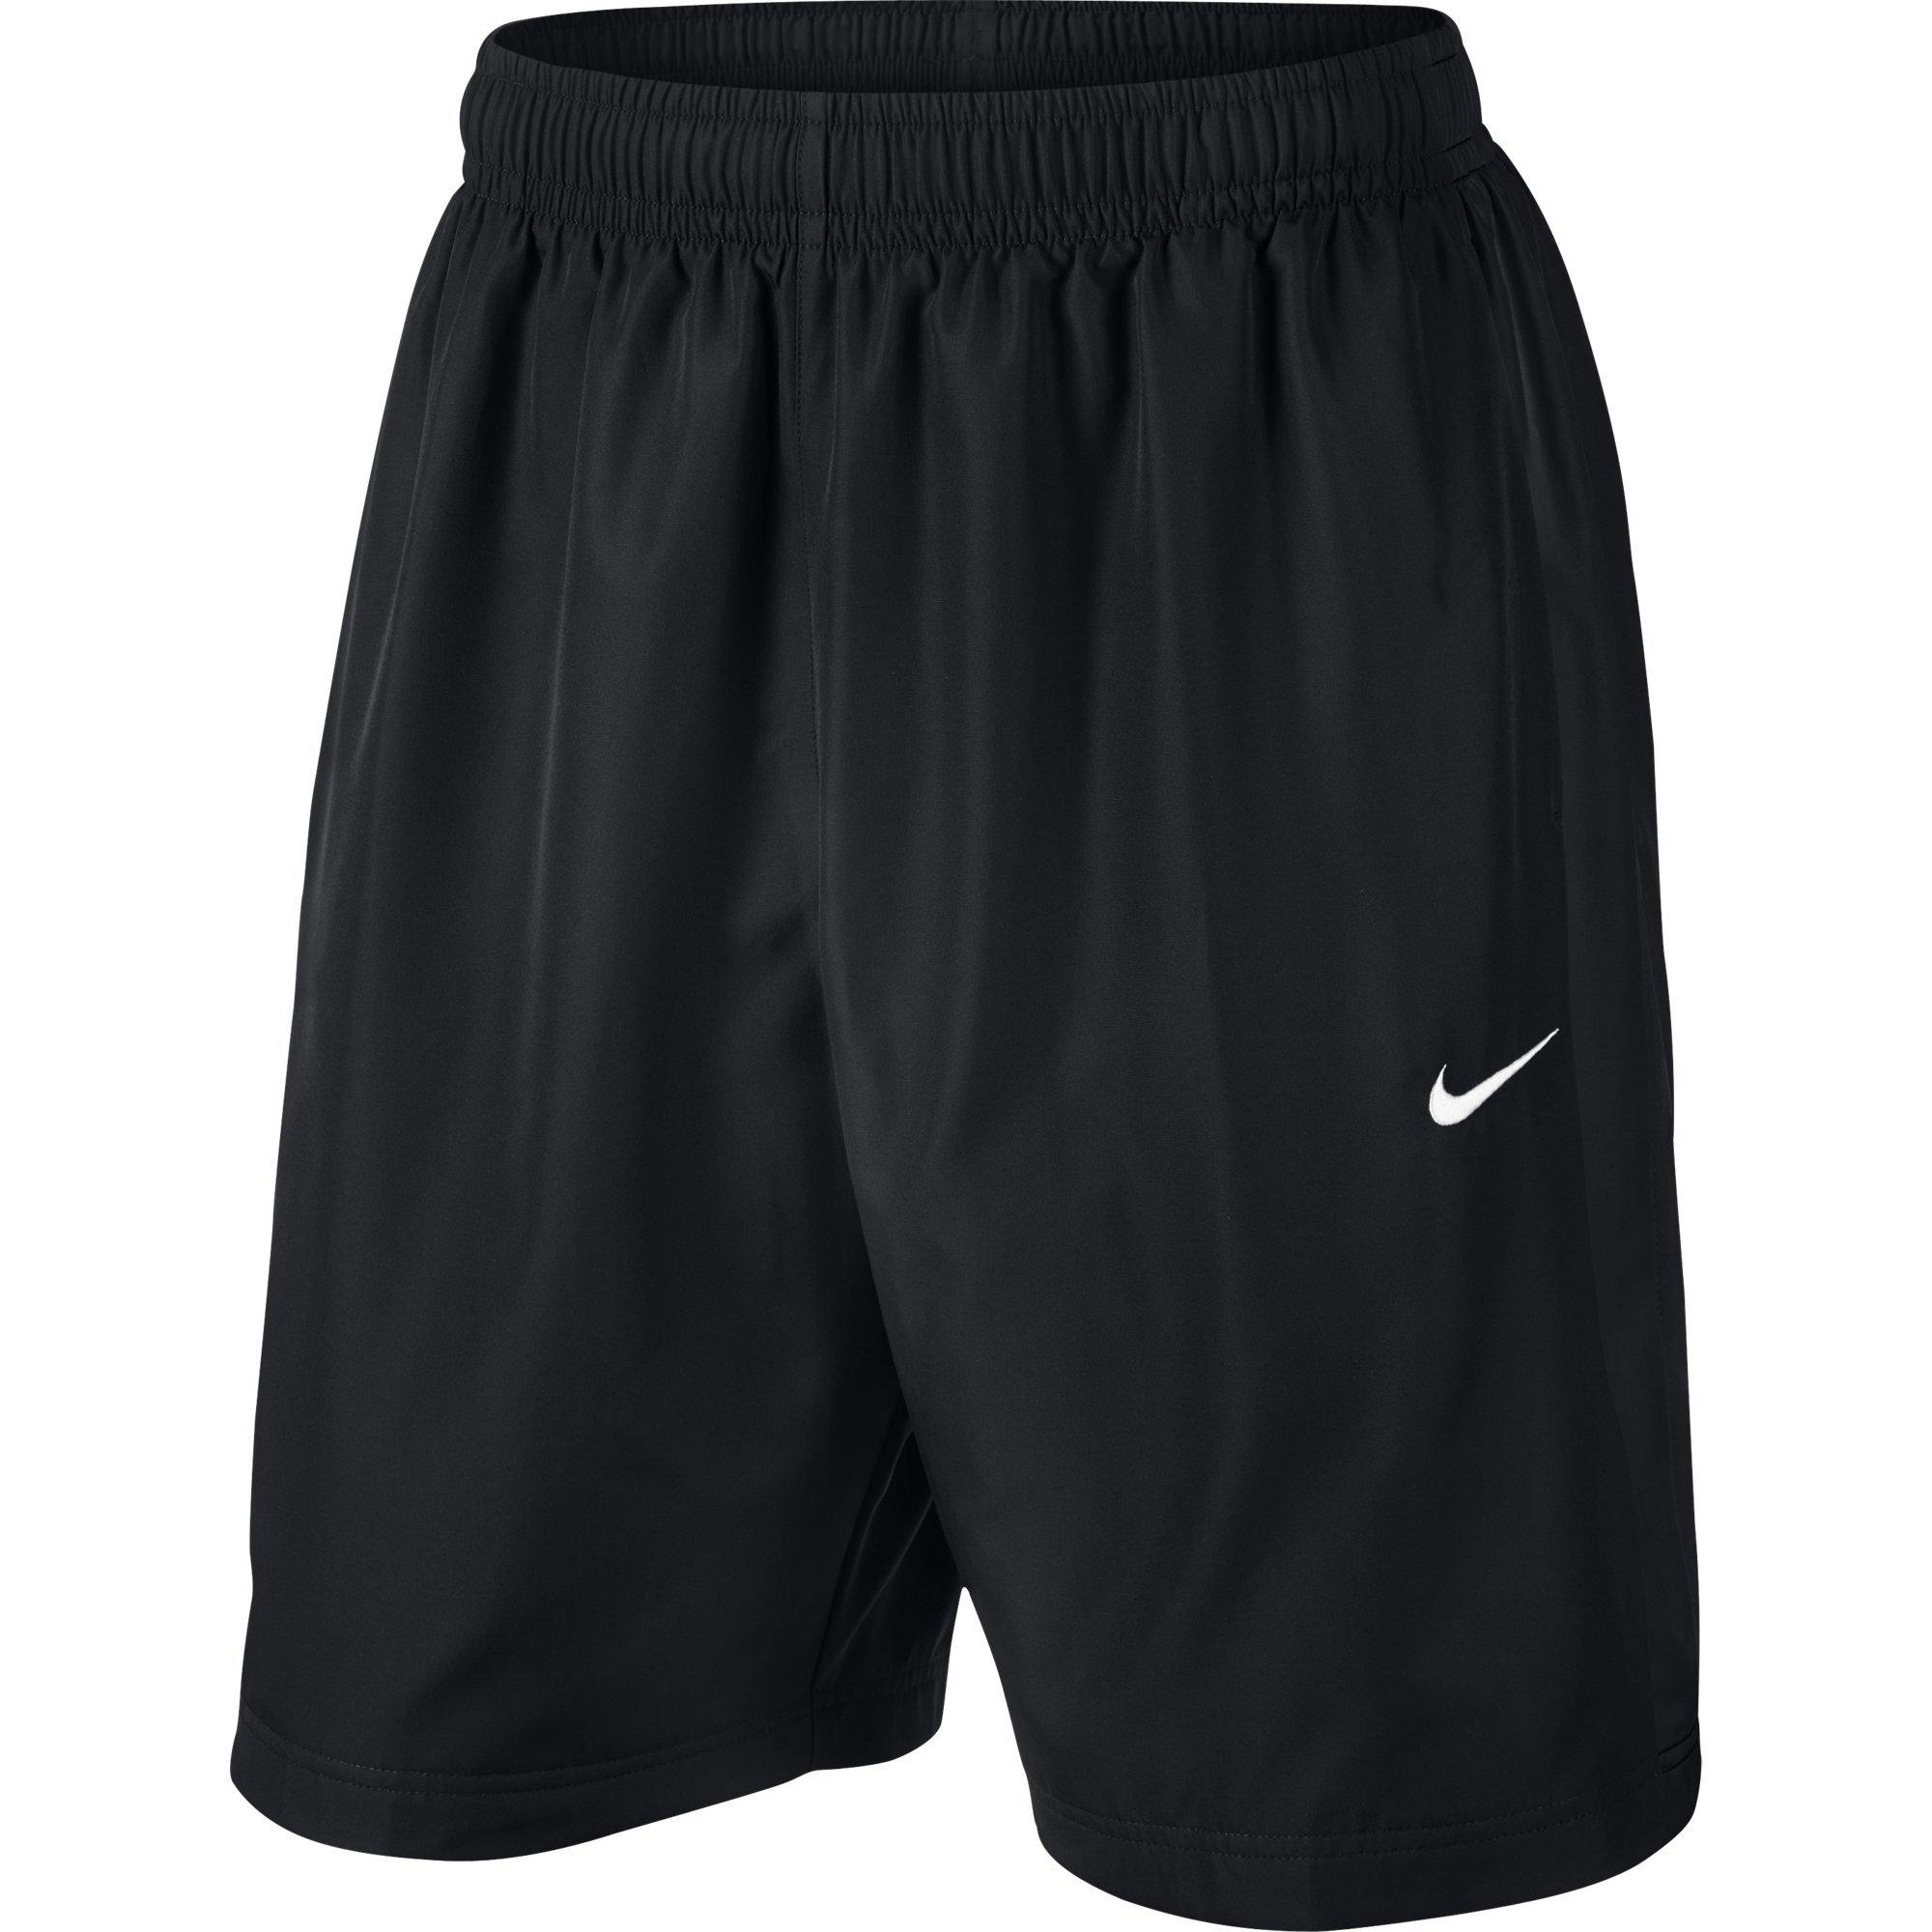 Nike Season Short 26 Cm Pantaloncini, Nero/Bianco, XXL